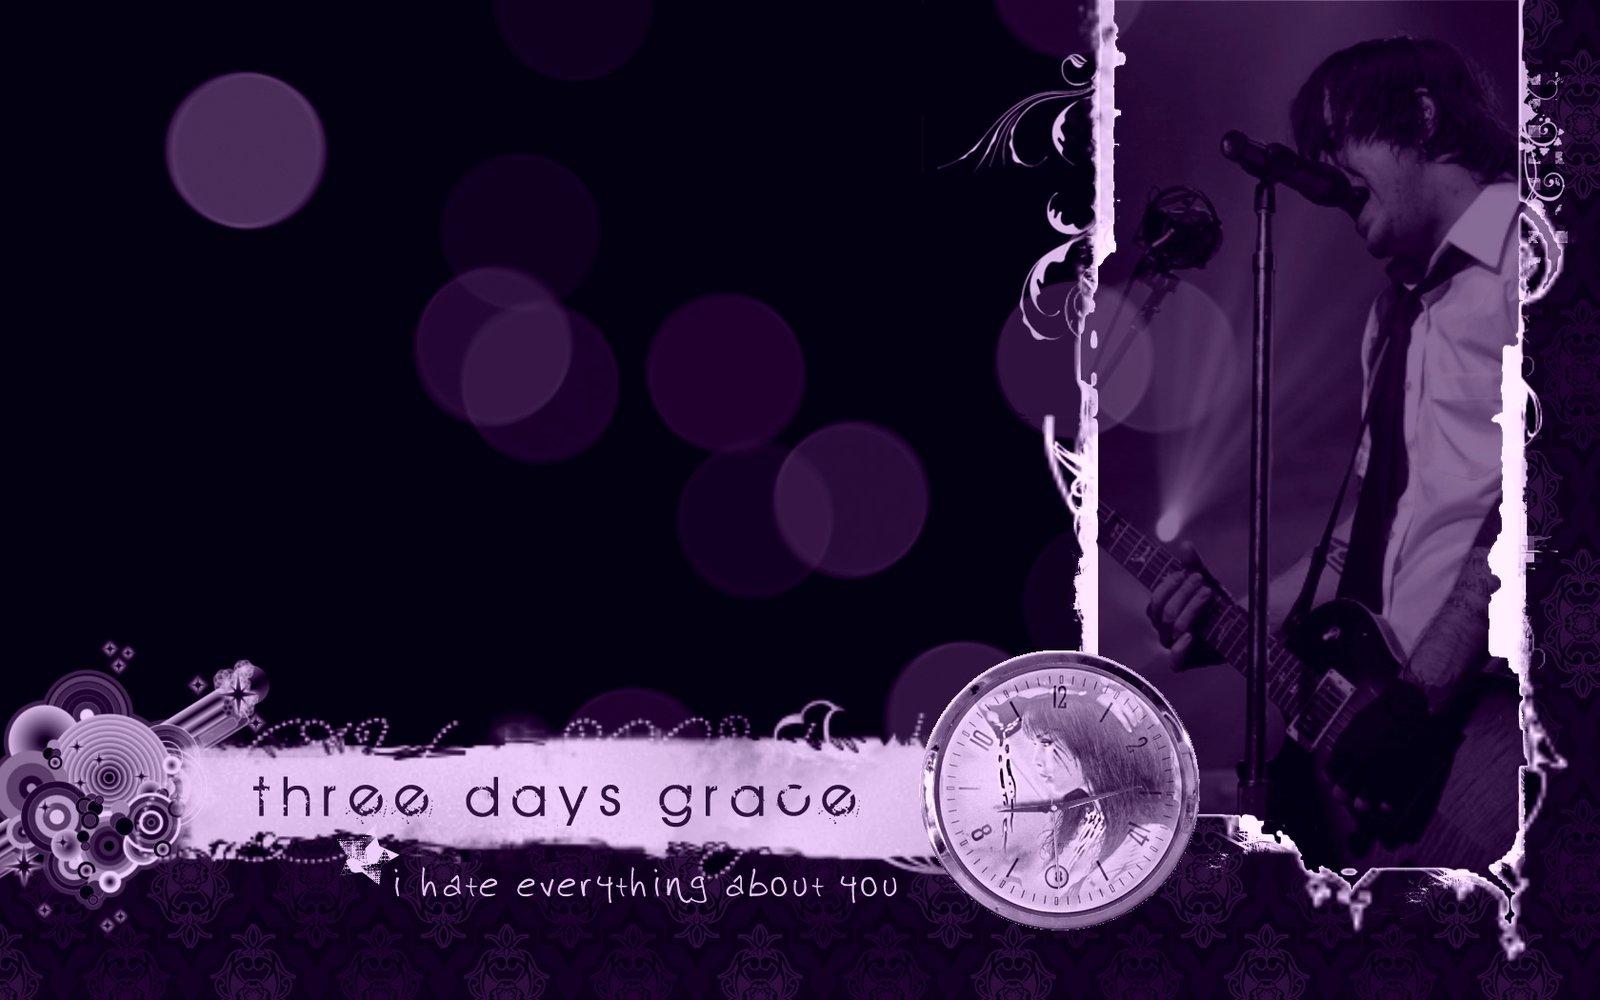 Three Days Grace wallpaper 7 by flatlace on deviantART 1600x1000